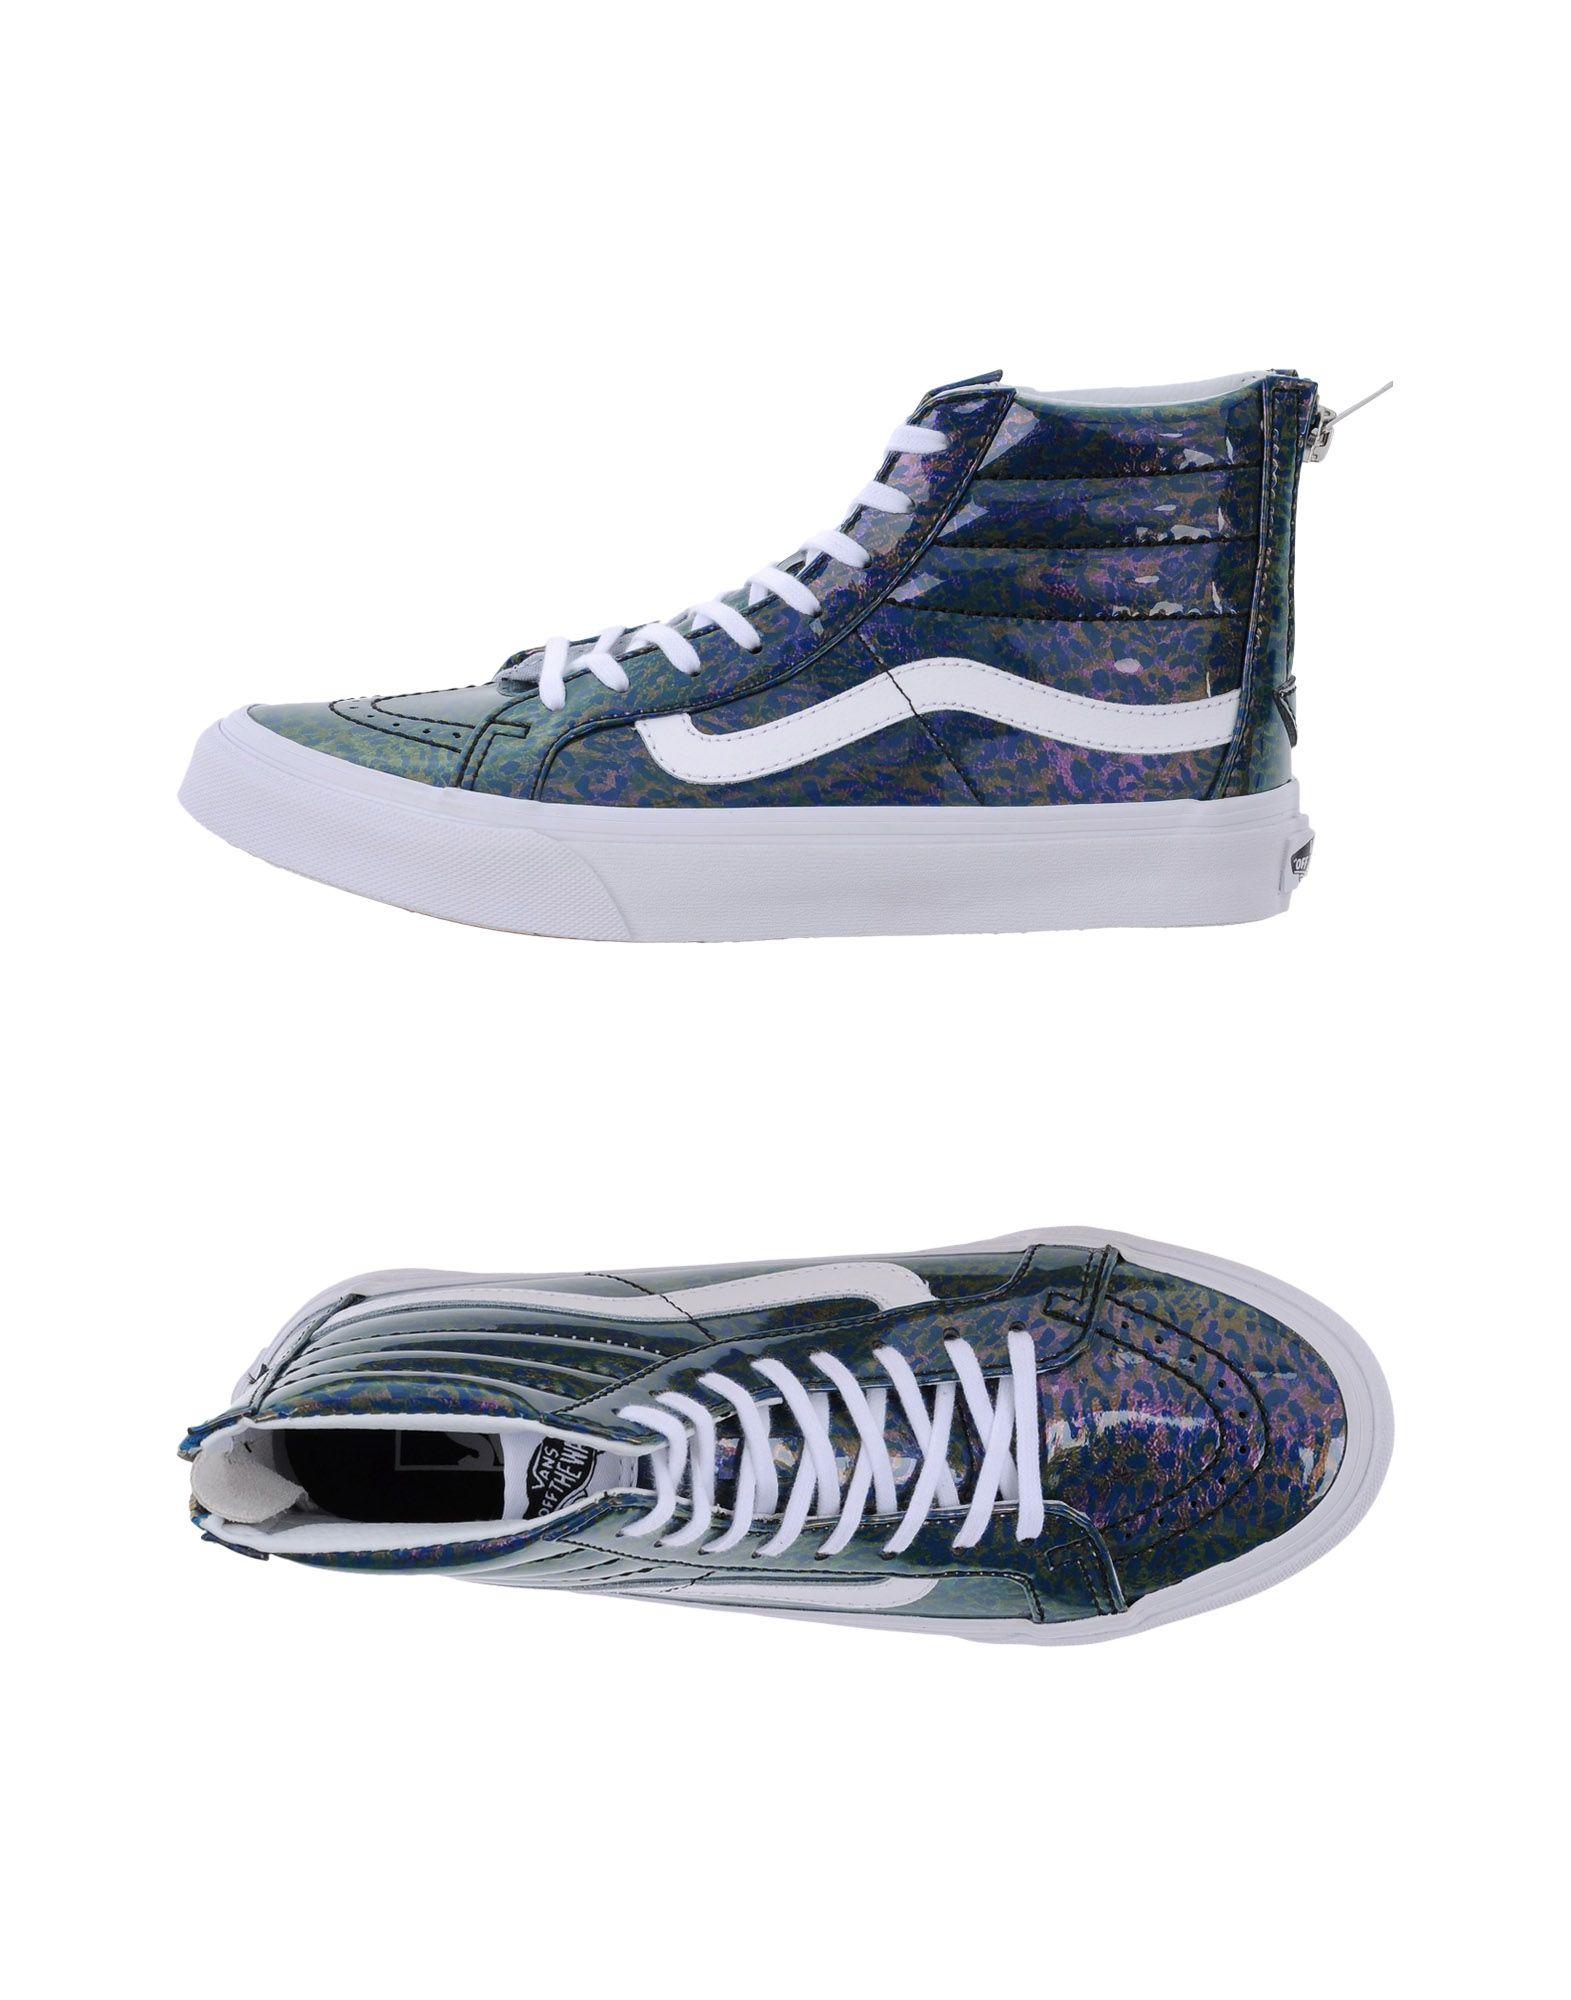 VANS Высокие кеды и кроссовки кеды кроссовки высокие dc council mid tx stone camo